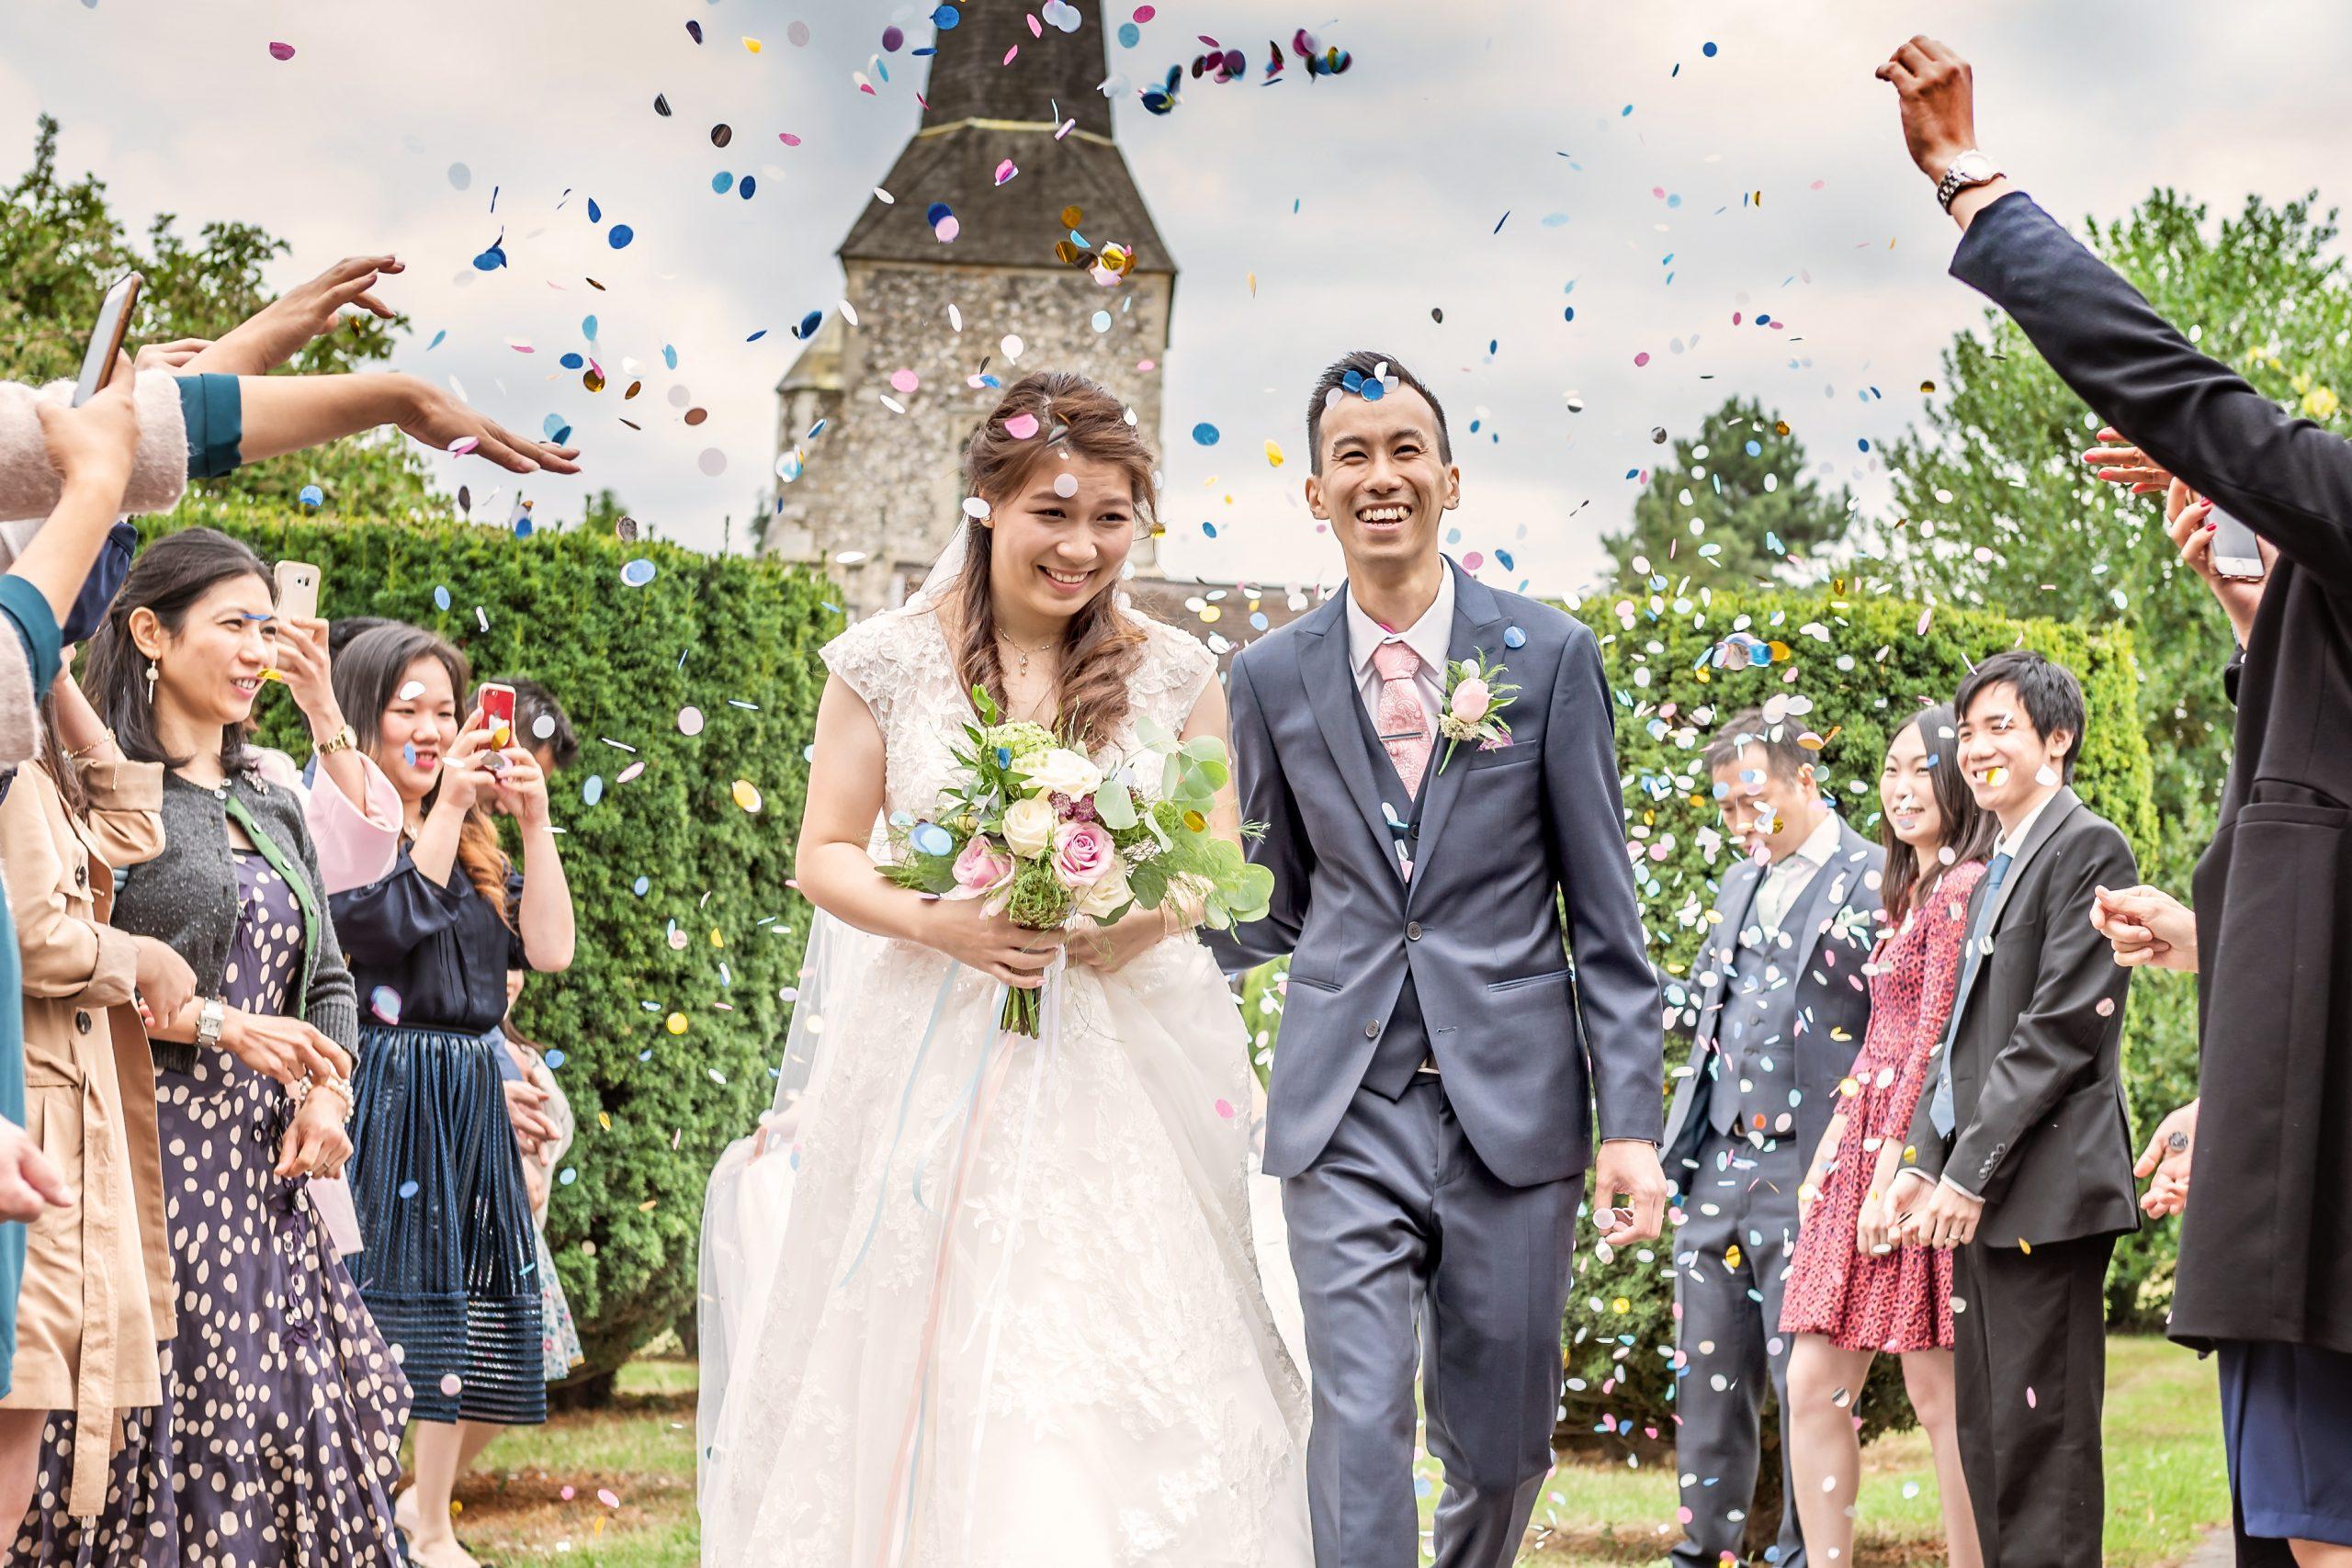 Confetti - South London Wedding Photographer